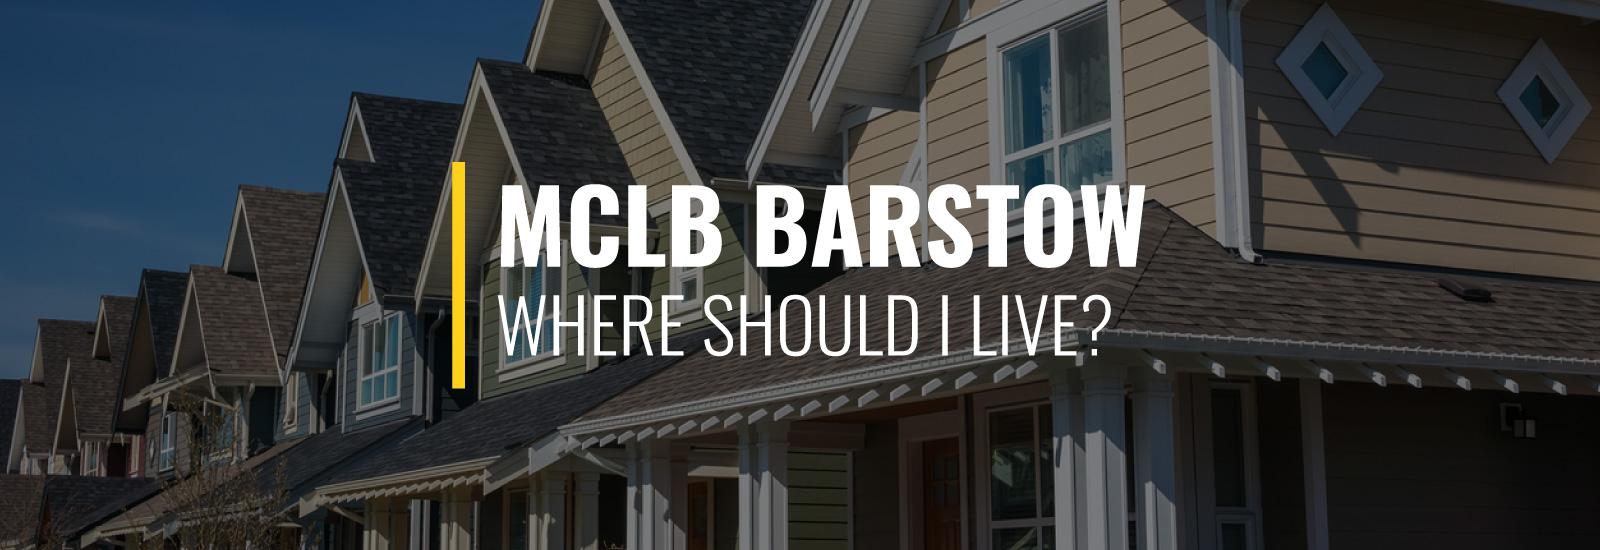 Where Should I Live Near MCLB Barstow?